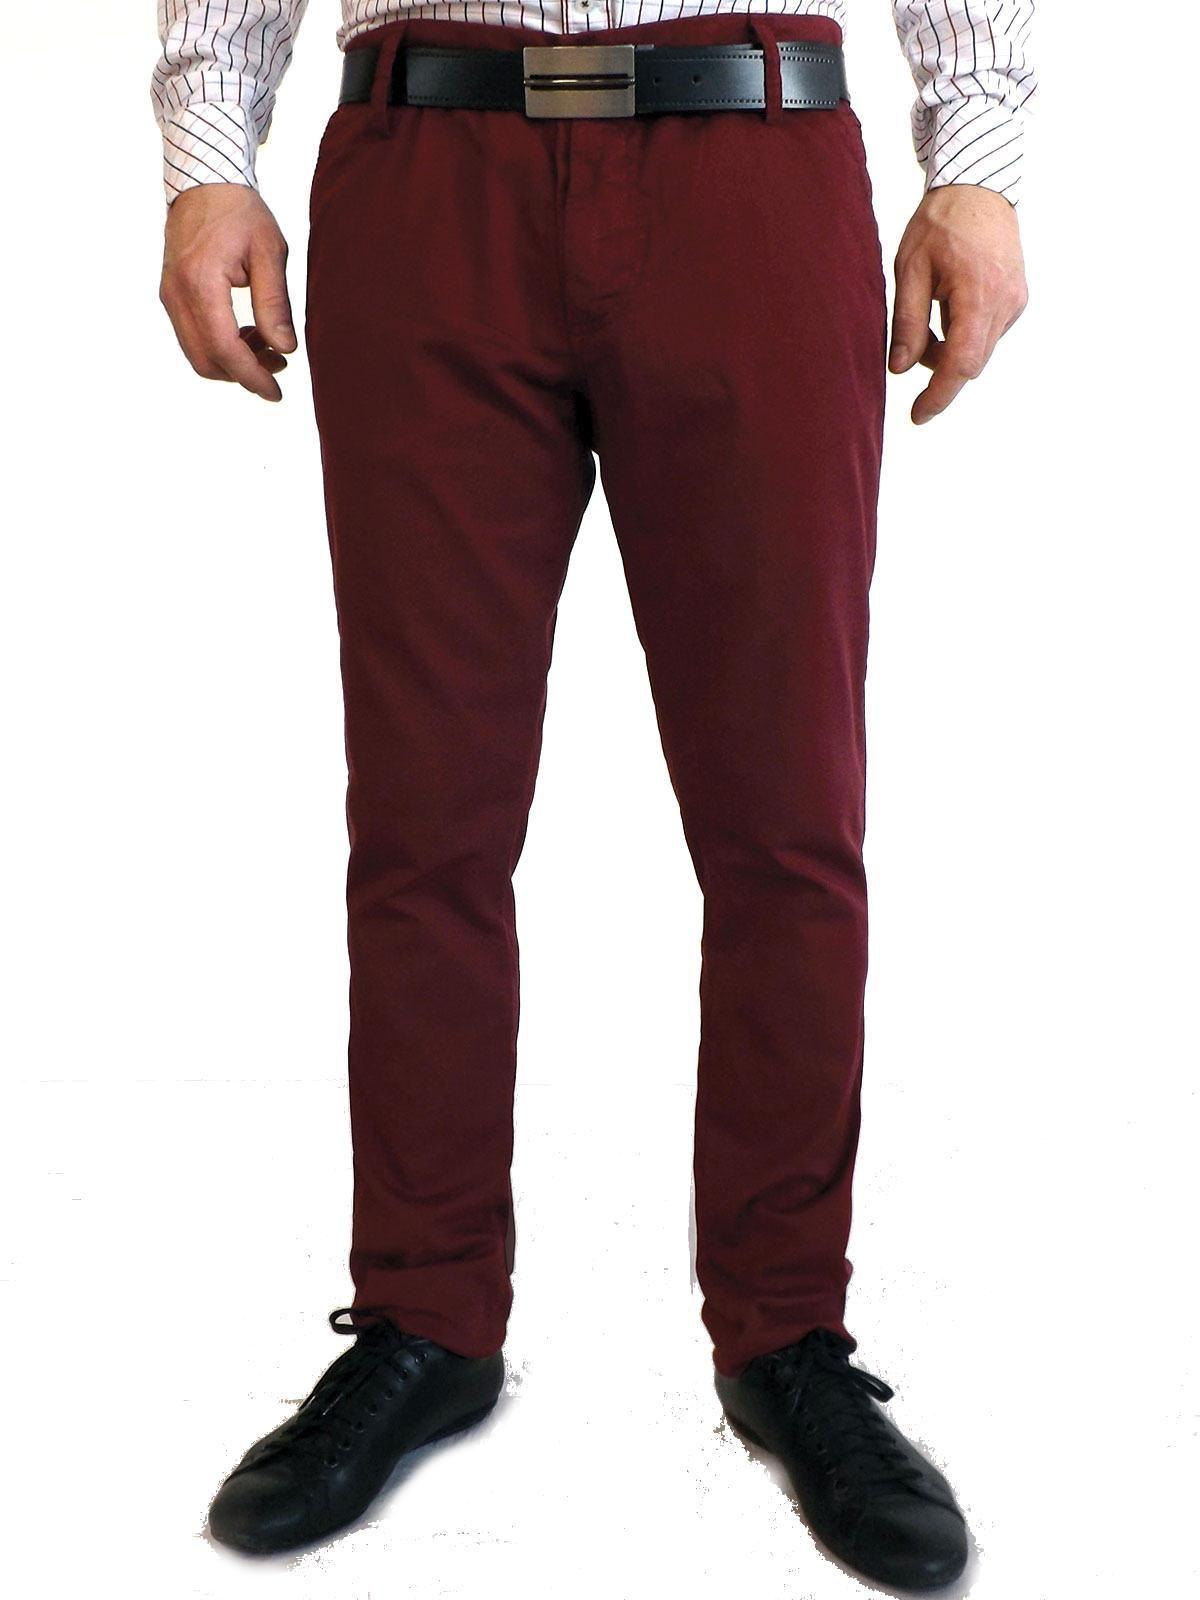 Pantaloni da uomo casual slim fit. 97% cotone, 3 % elastane